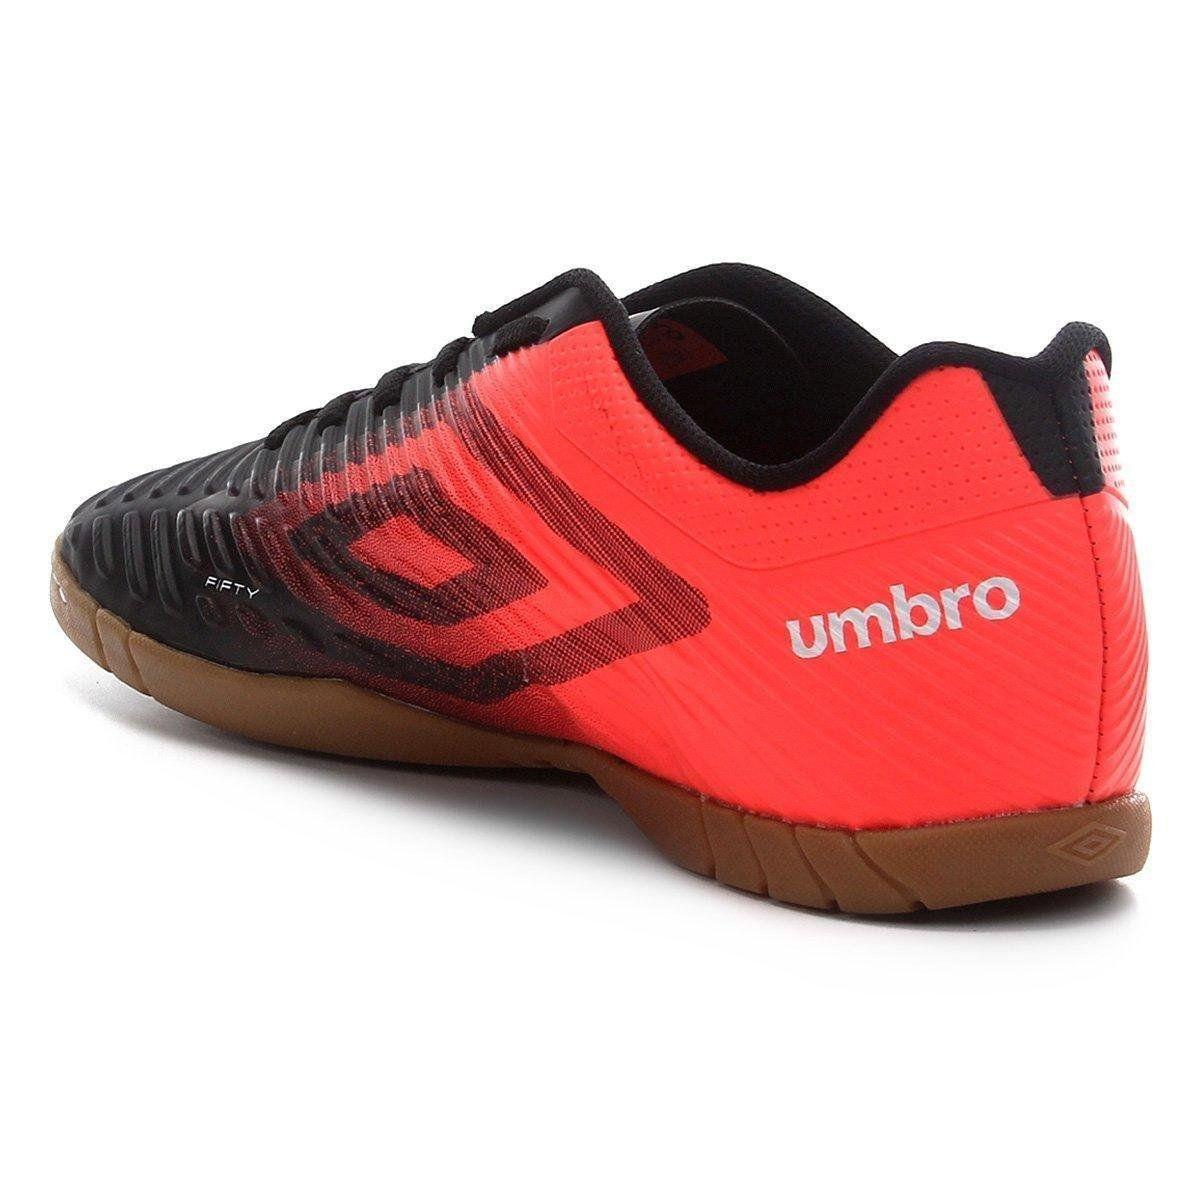 Tenis Umbro Indoor Fifty Iii 3 Futsal Costurada